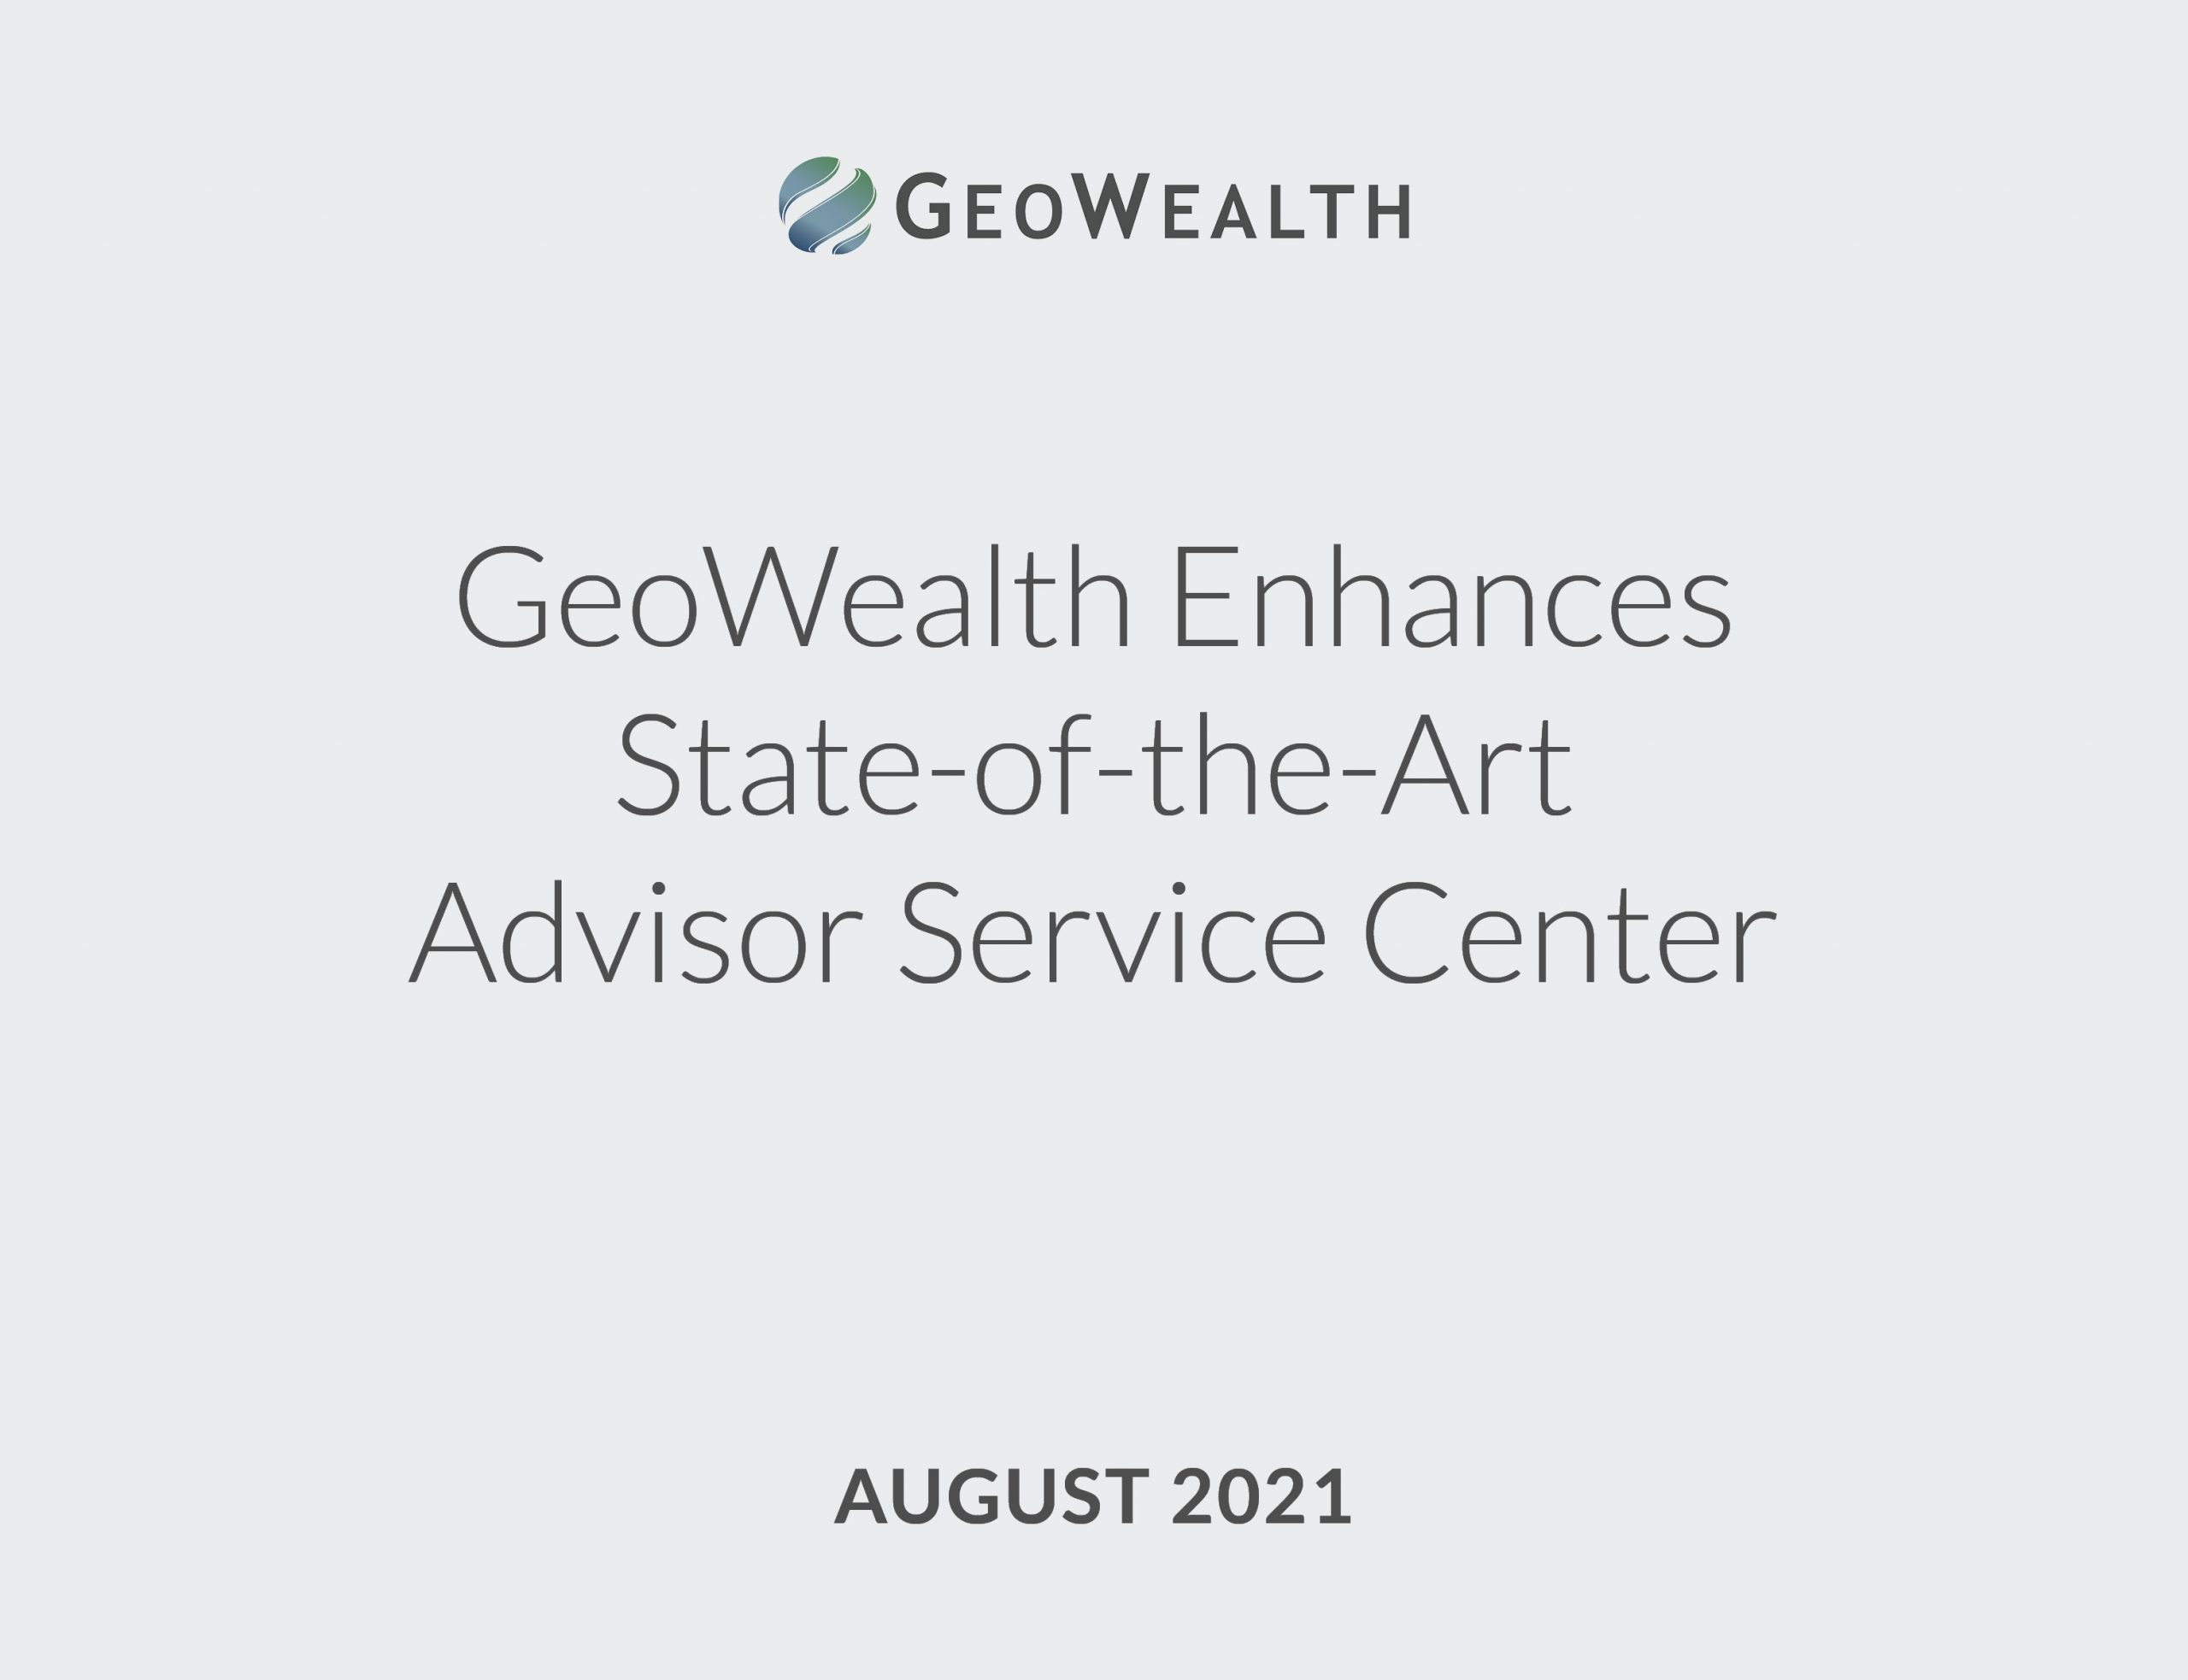 GeoWealth Advisor Service Center